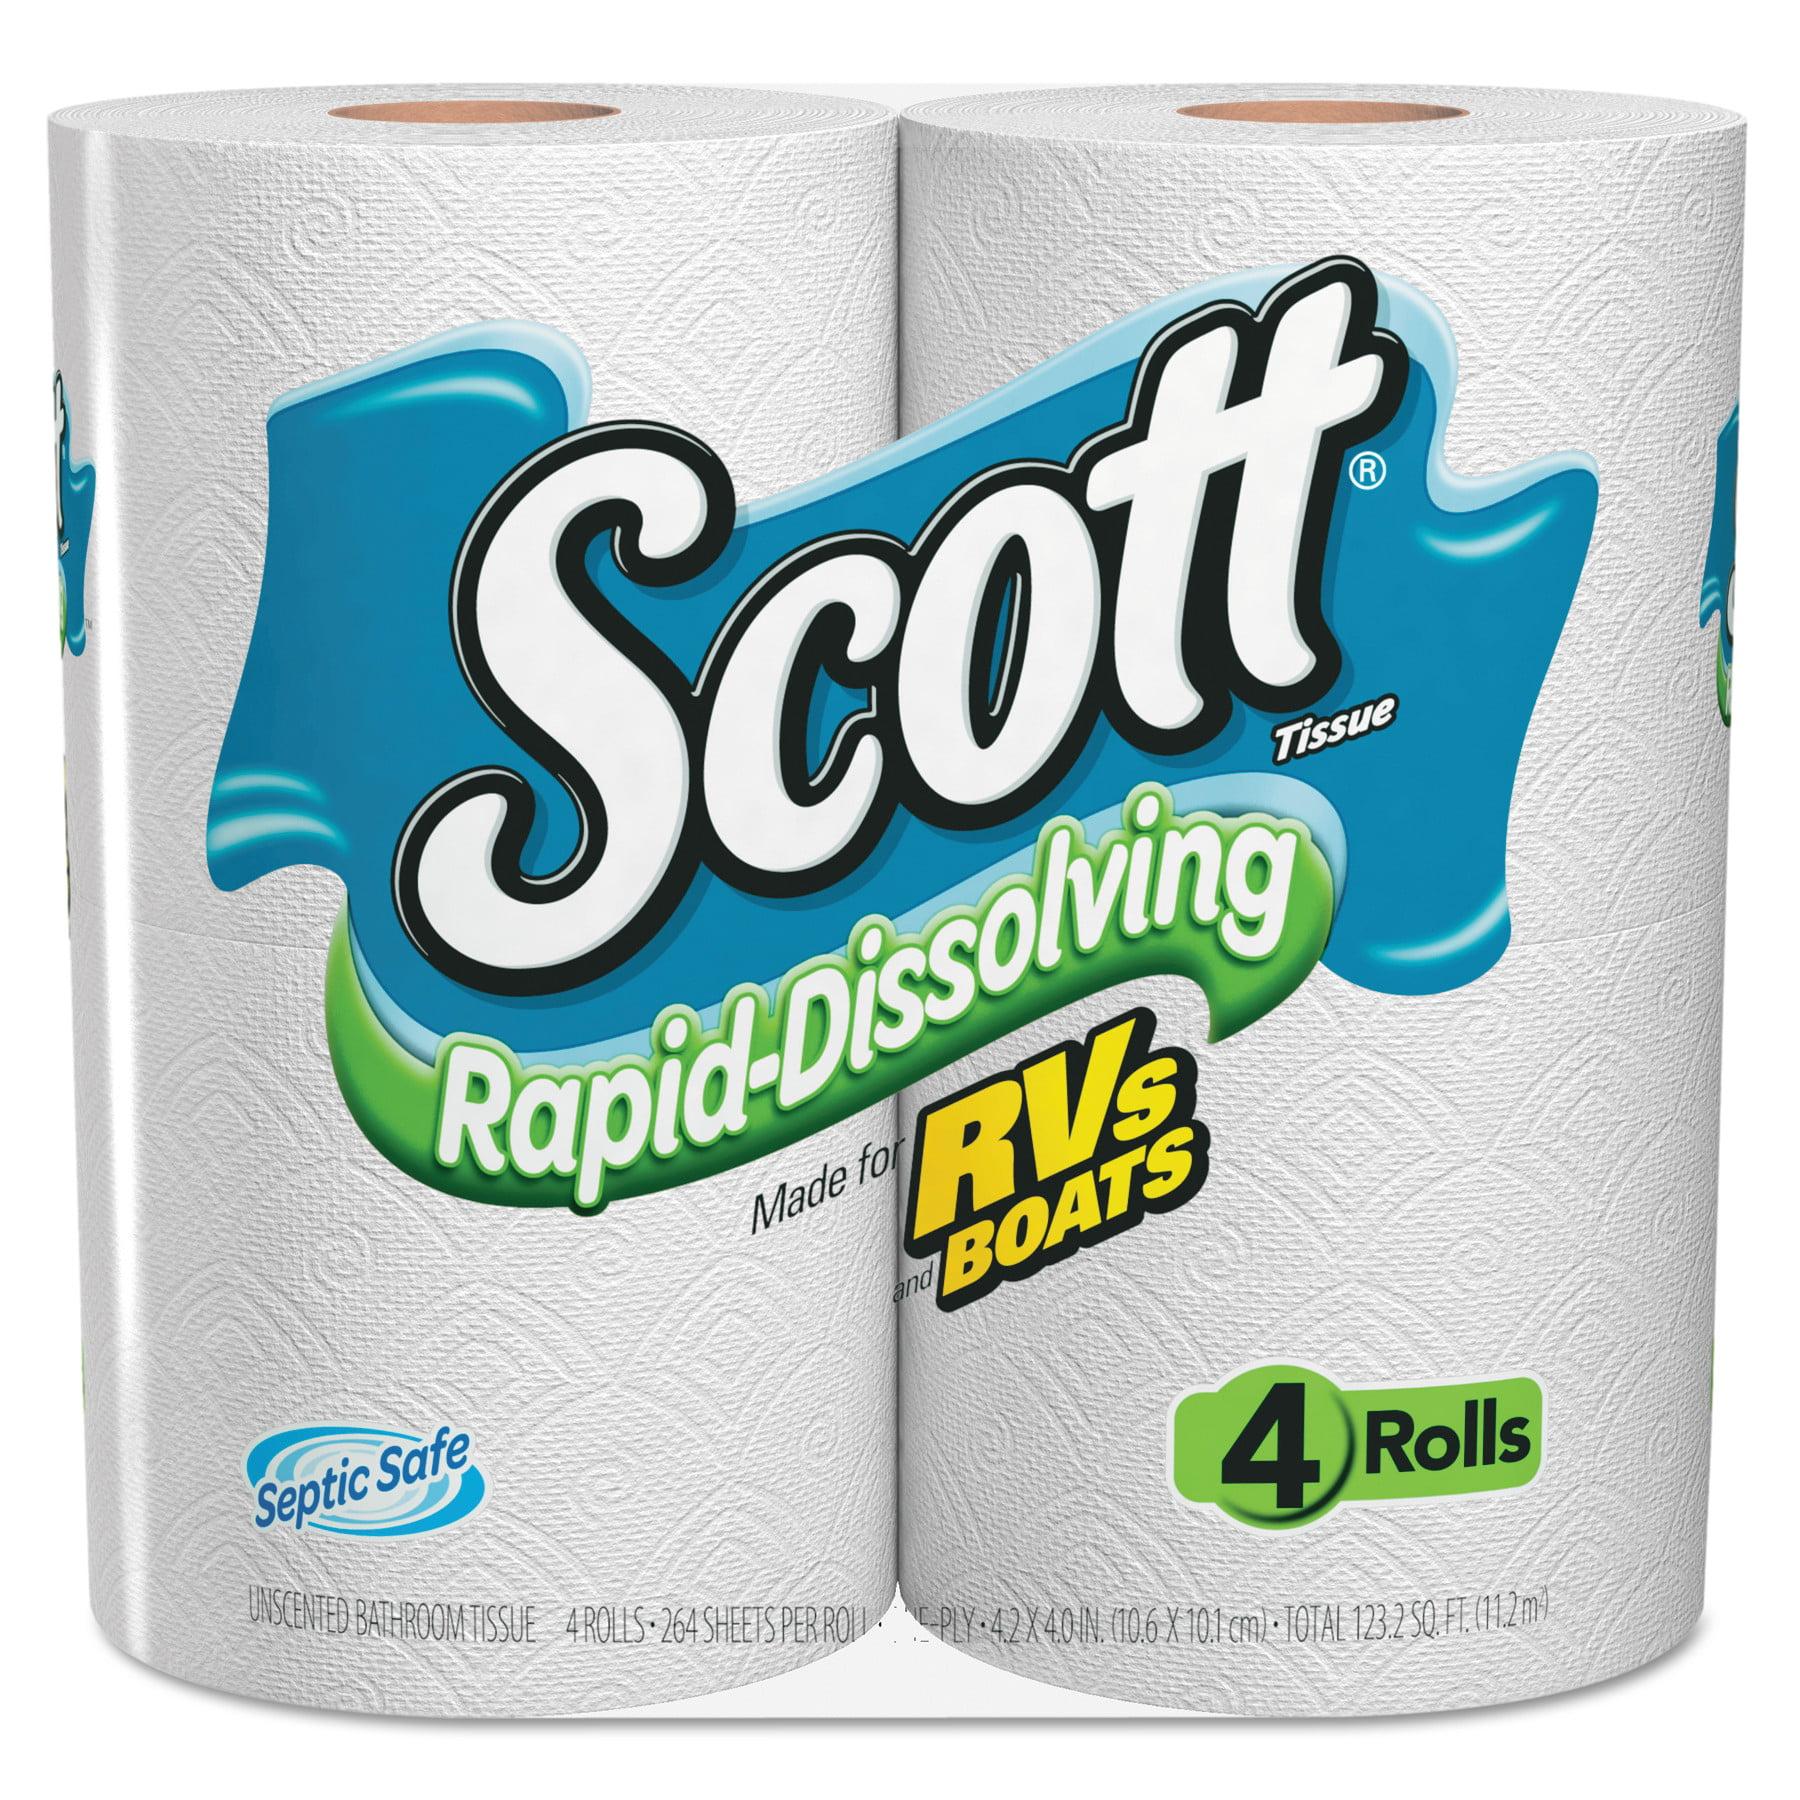 Scott Toilet Paper, Rapid Dissolve, 4 Rolls